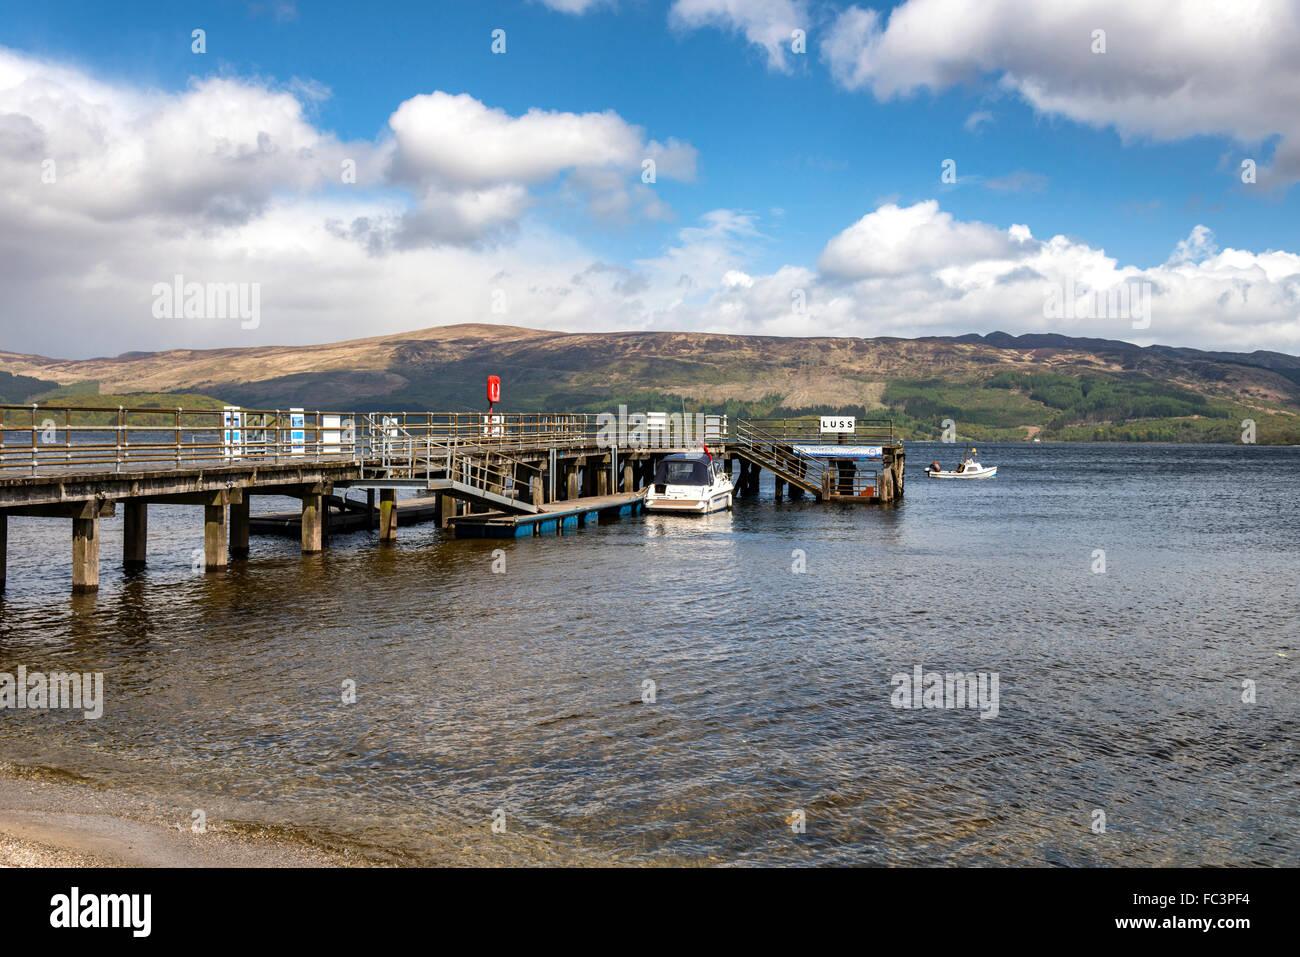 Luss pier on the banks of Loch Lomond - Stock Image